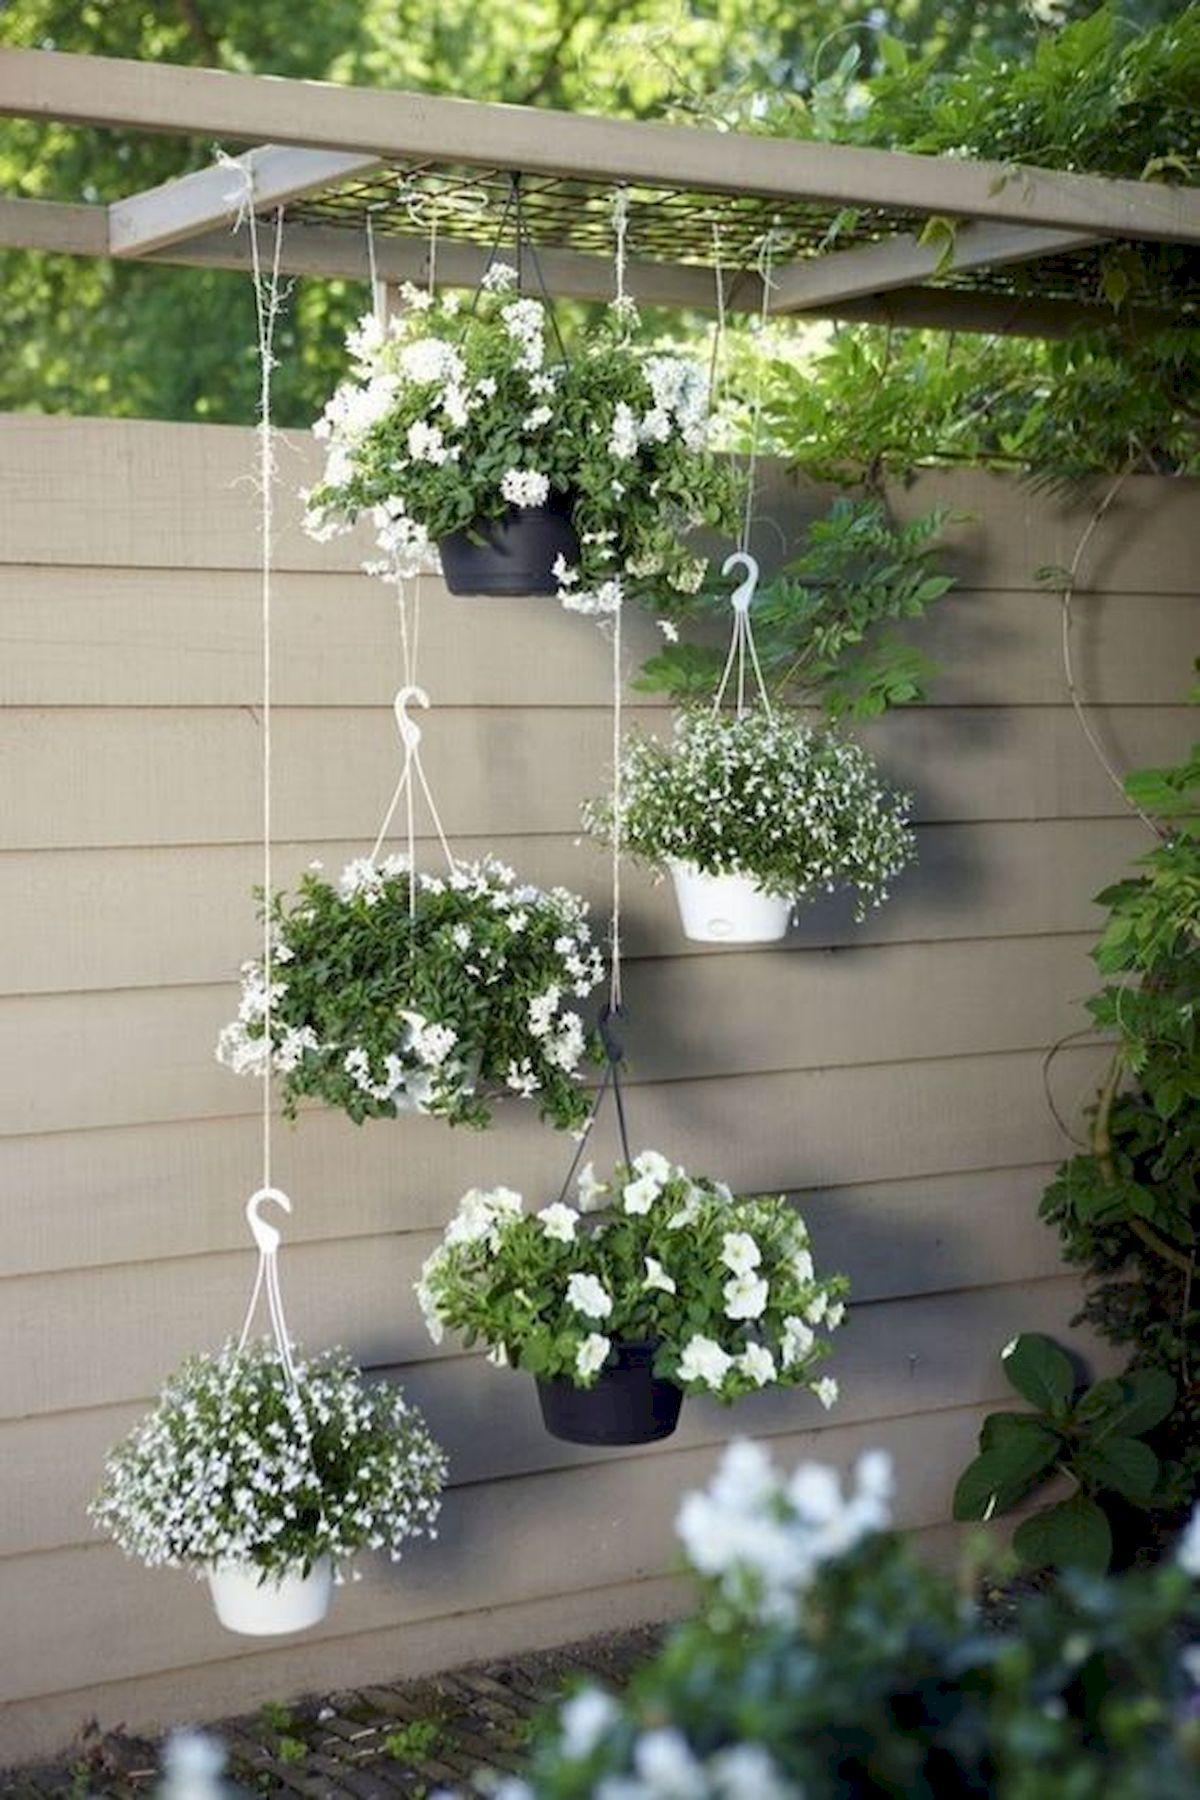 50 Awesome DIY Hanging Plants Ideas For Modern Backyard Garden (44)